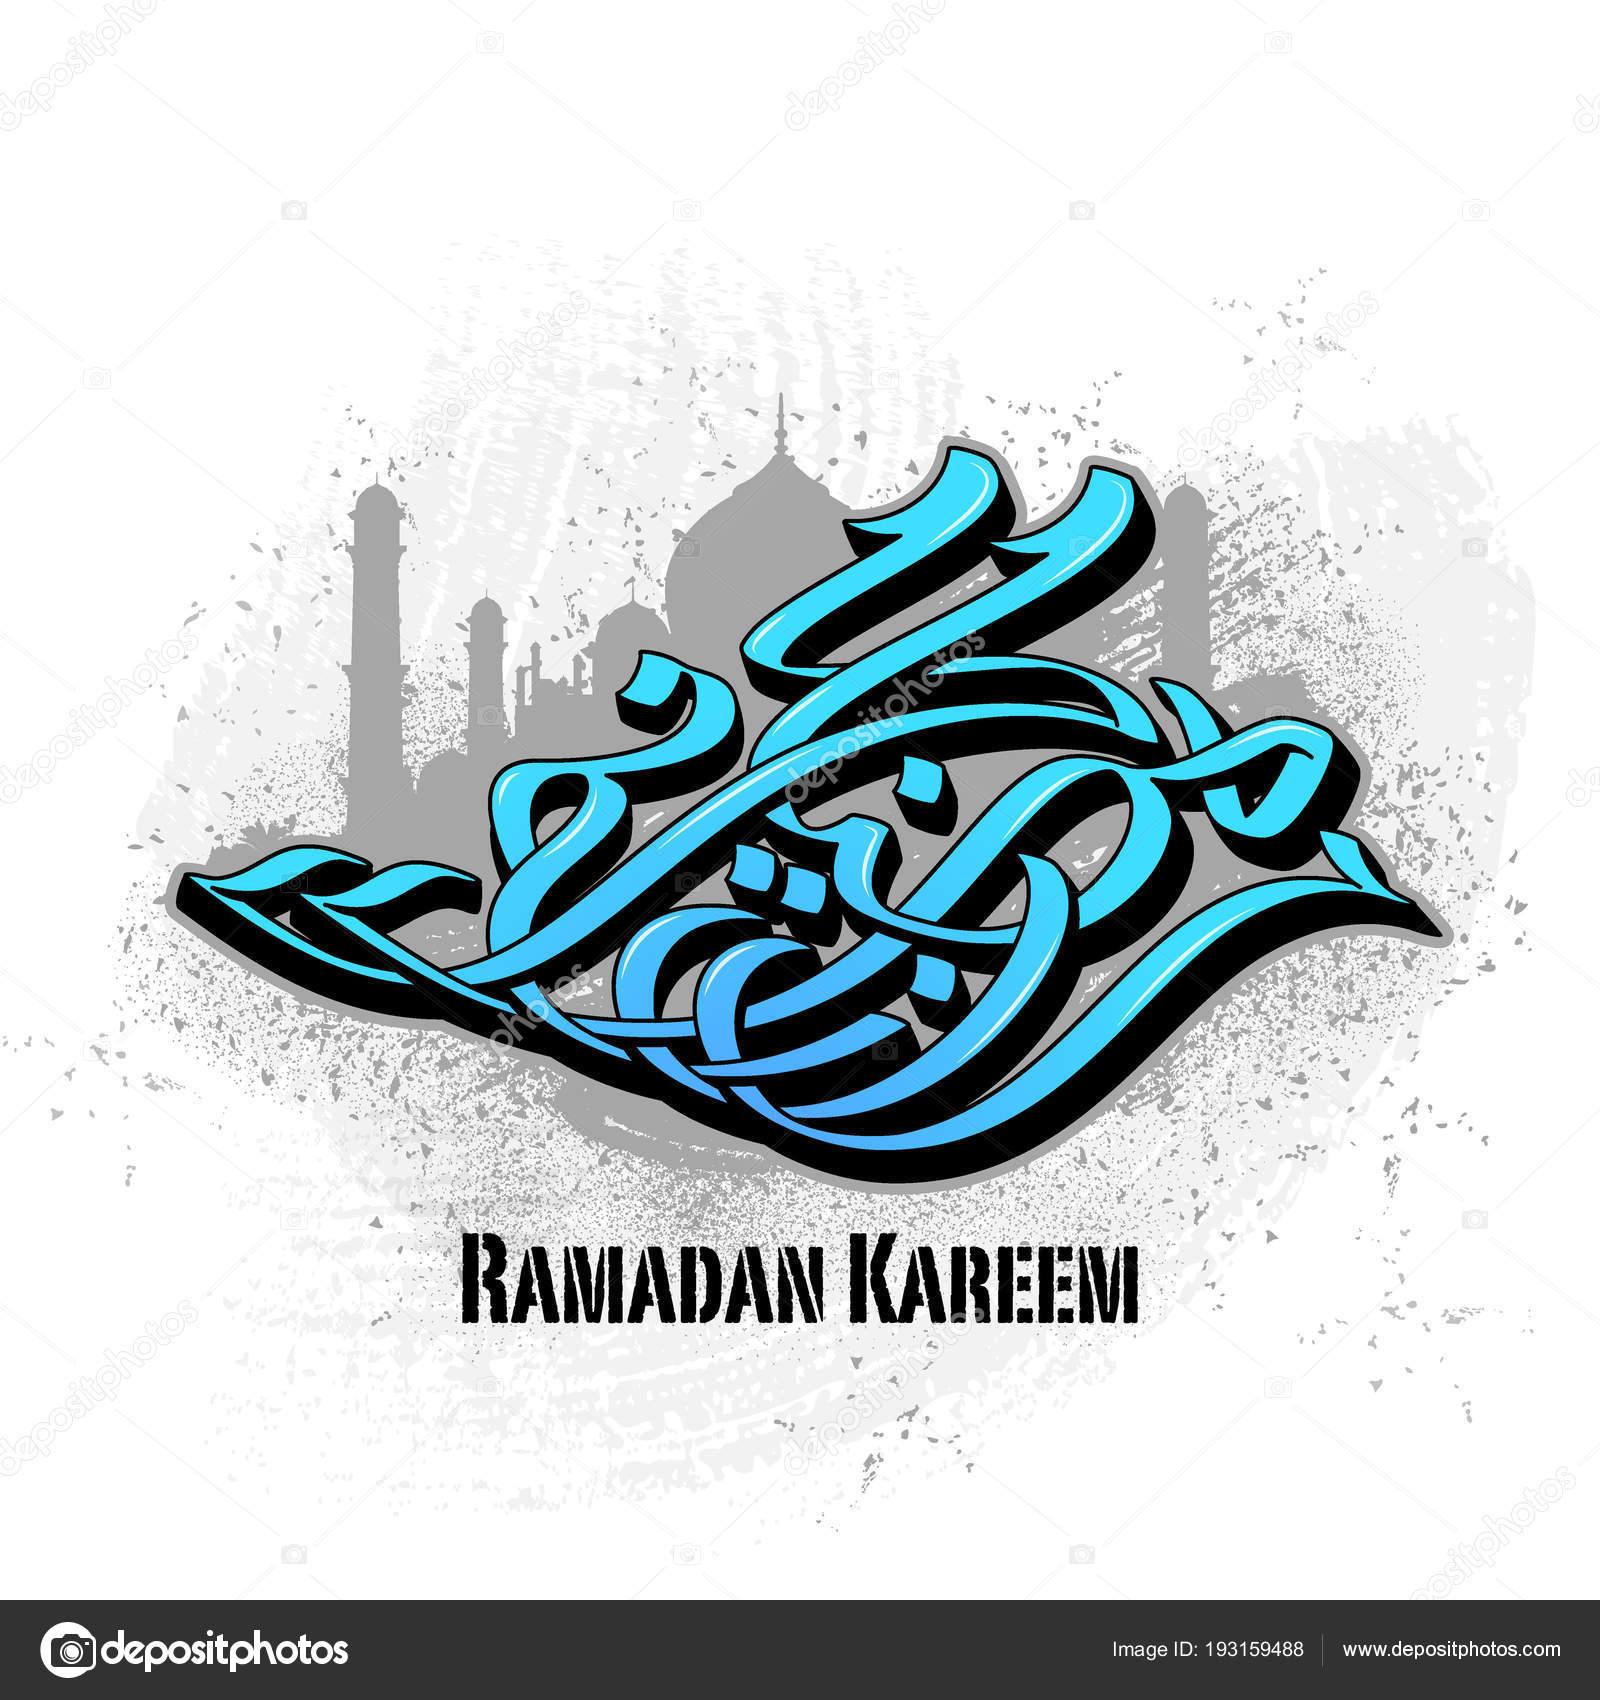 Ramadan kareem arabic calligraphy islamic greeting stock vector ramadan kareem arabic calligraphy islamic greeting stock vector m4hsunfo Gallery